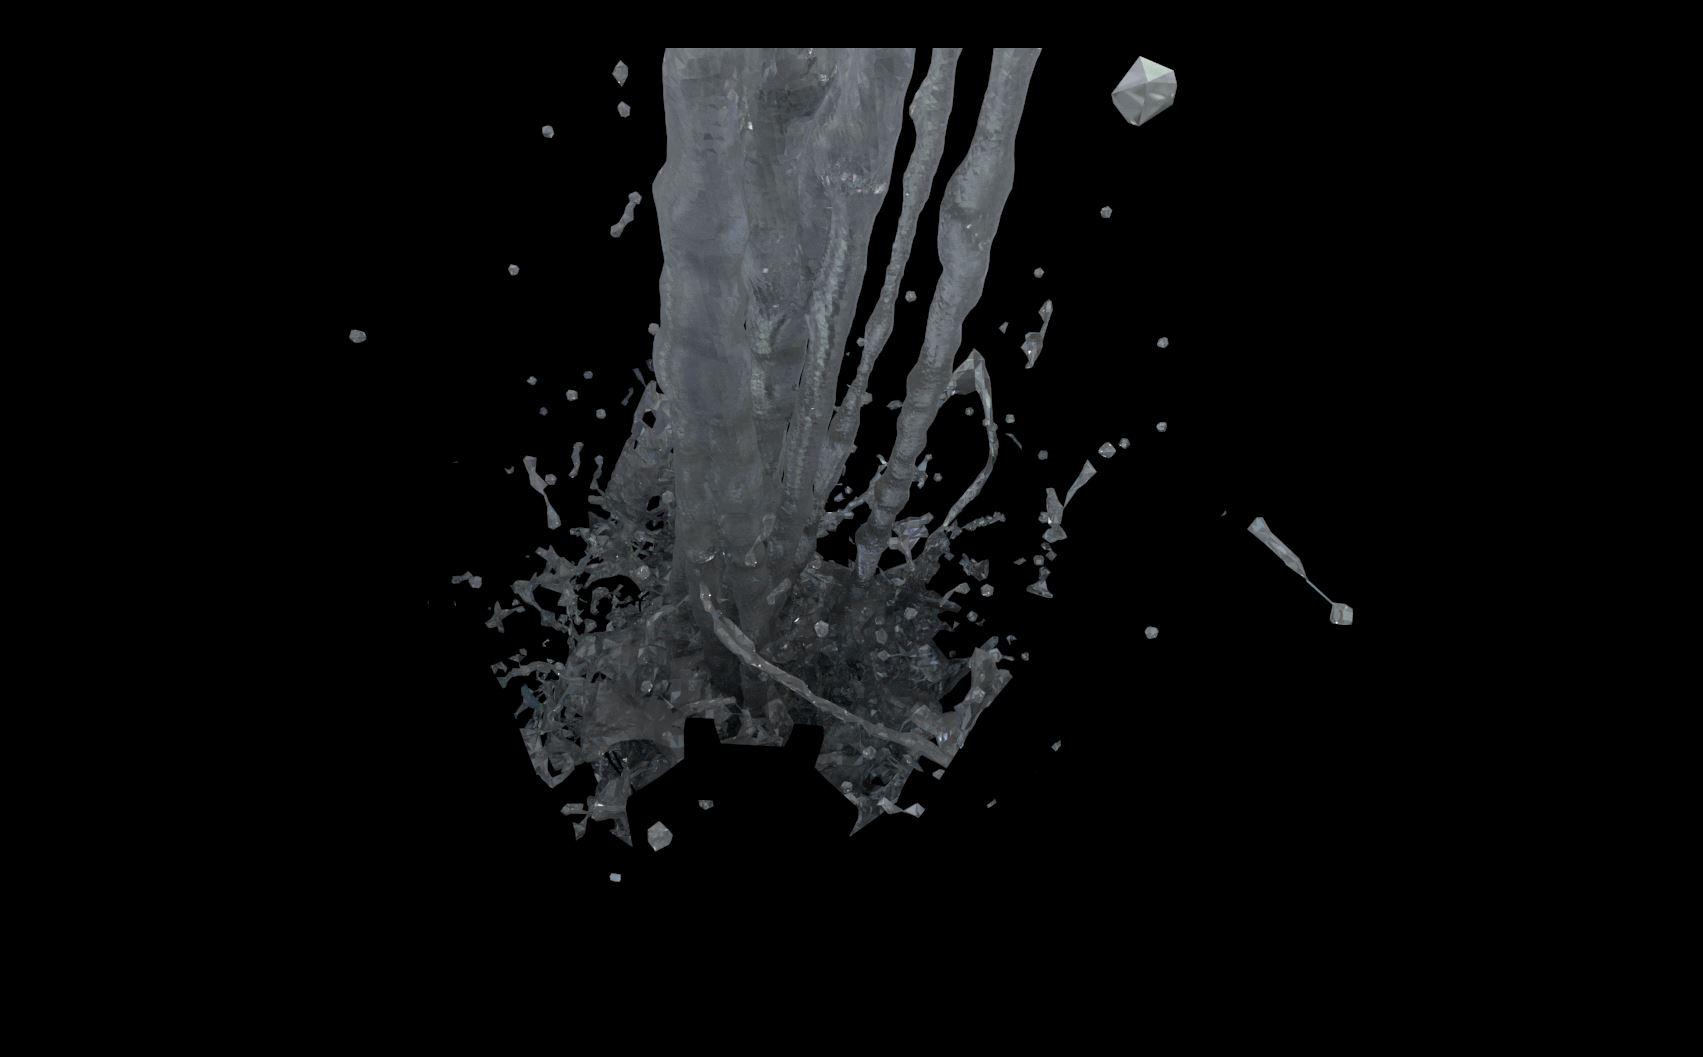 ICE_007.JPG